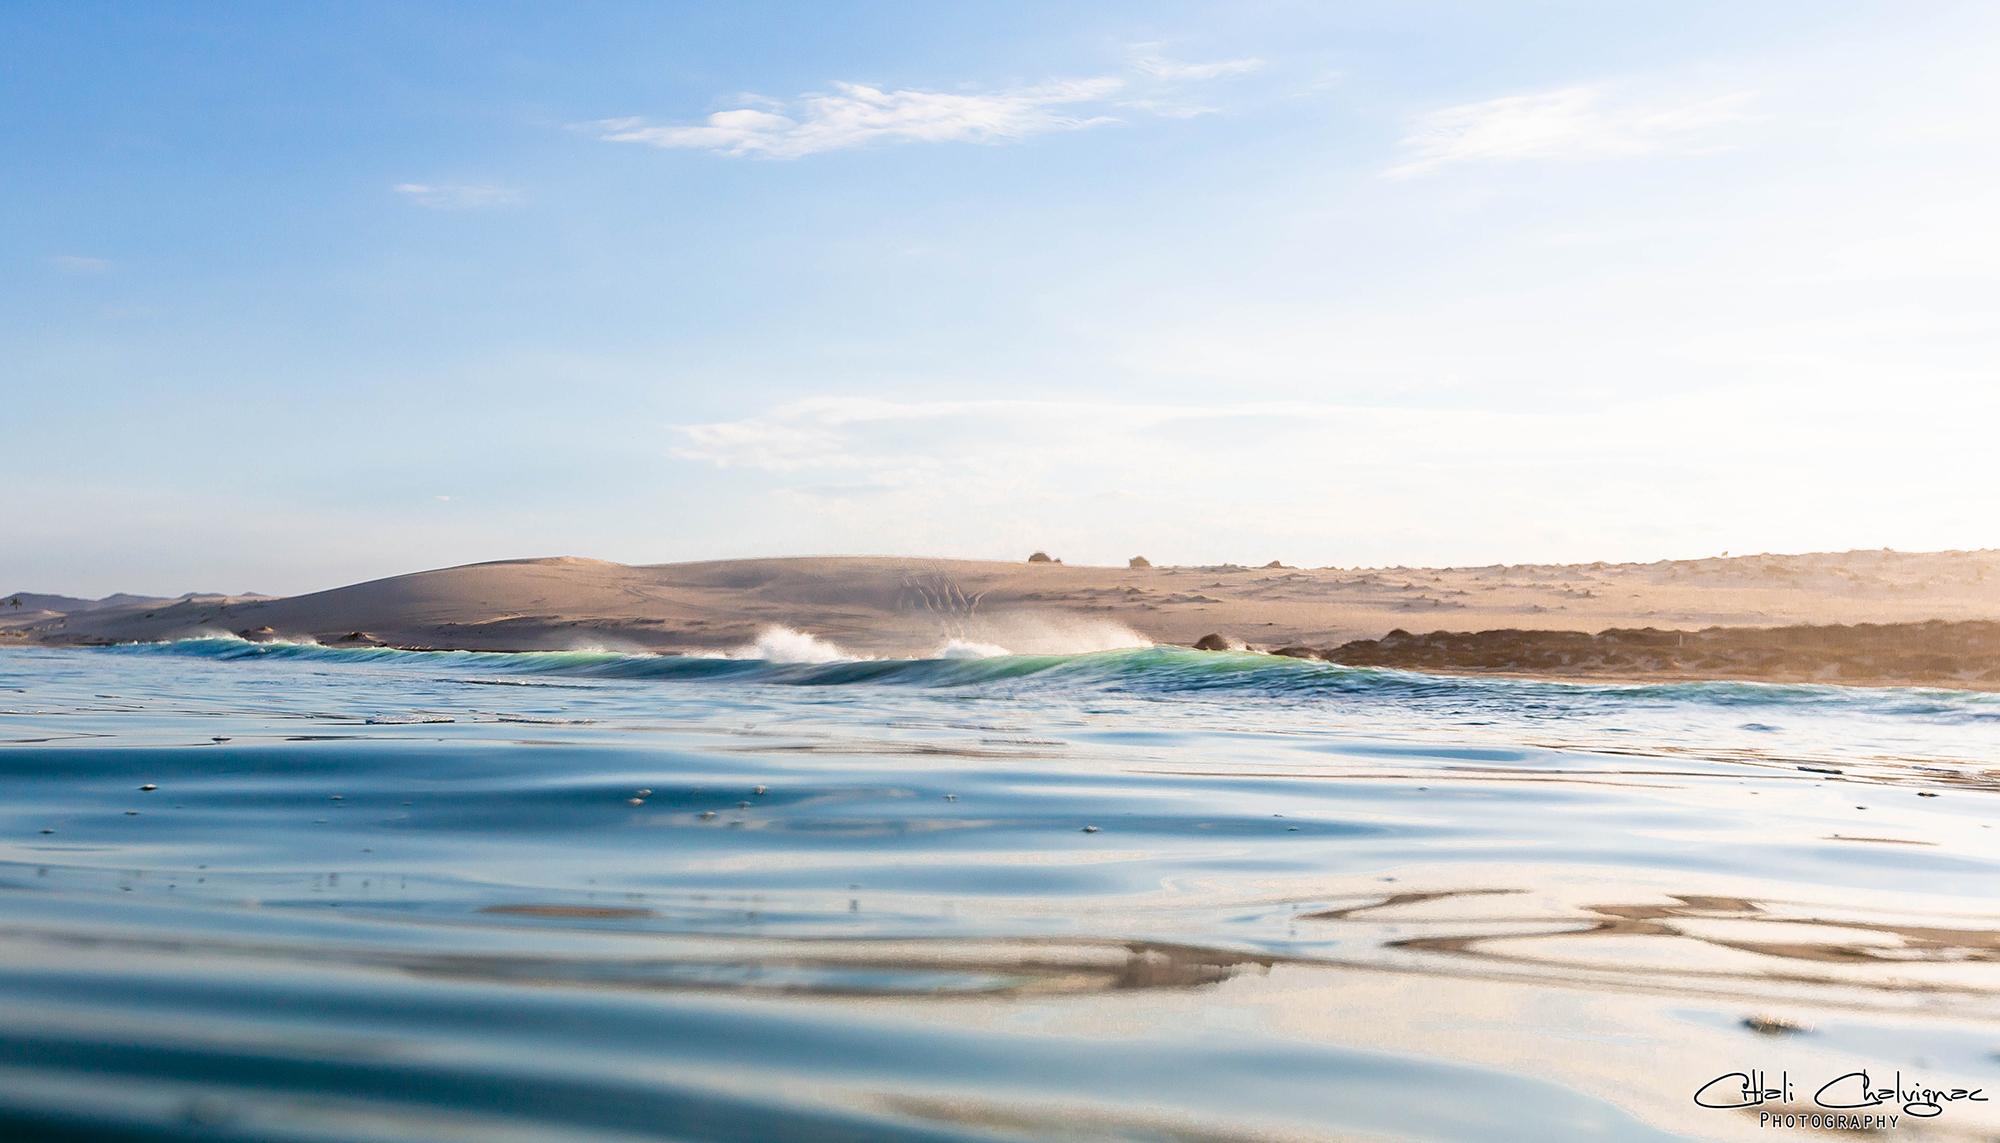 Galeria Ocean imagen 5 Citlali Chalvignac